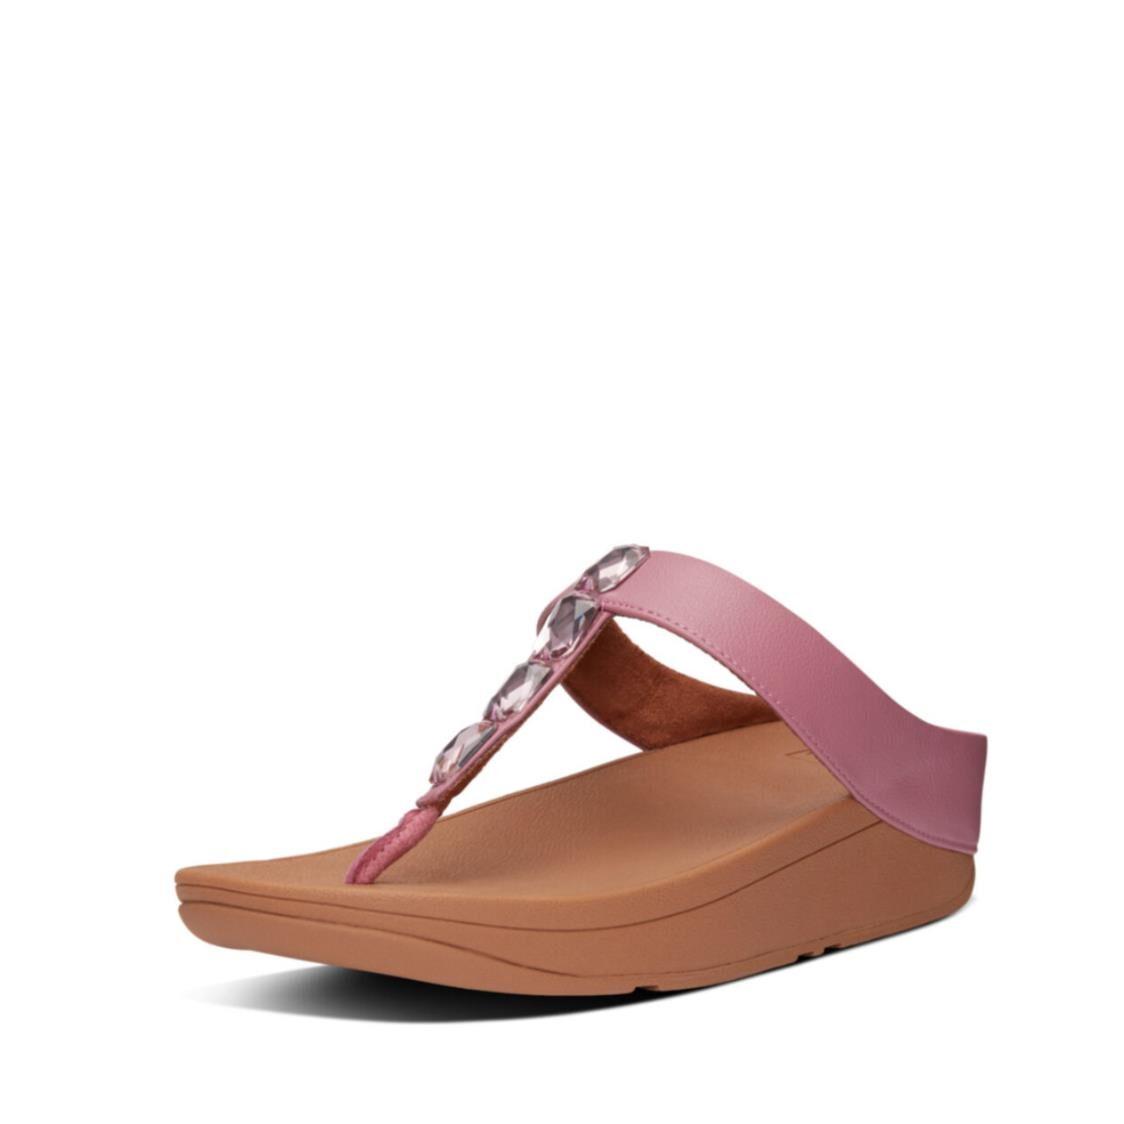 Fitflop Velda Jewel Toe Thongs Heather Pink